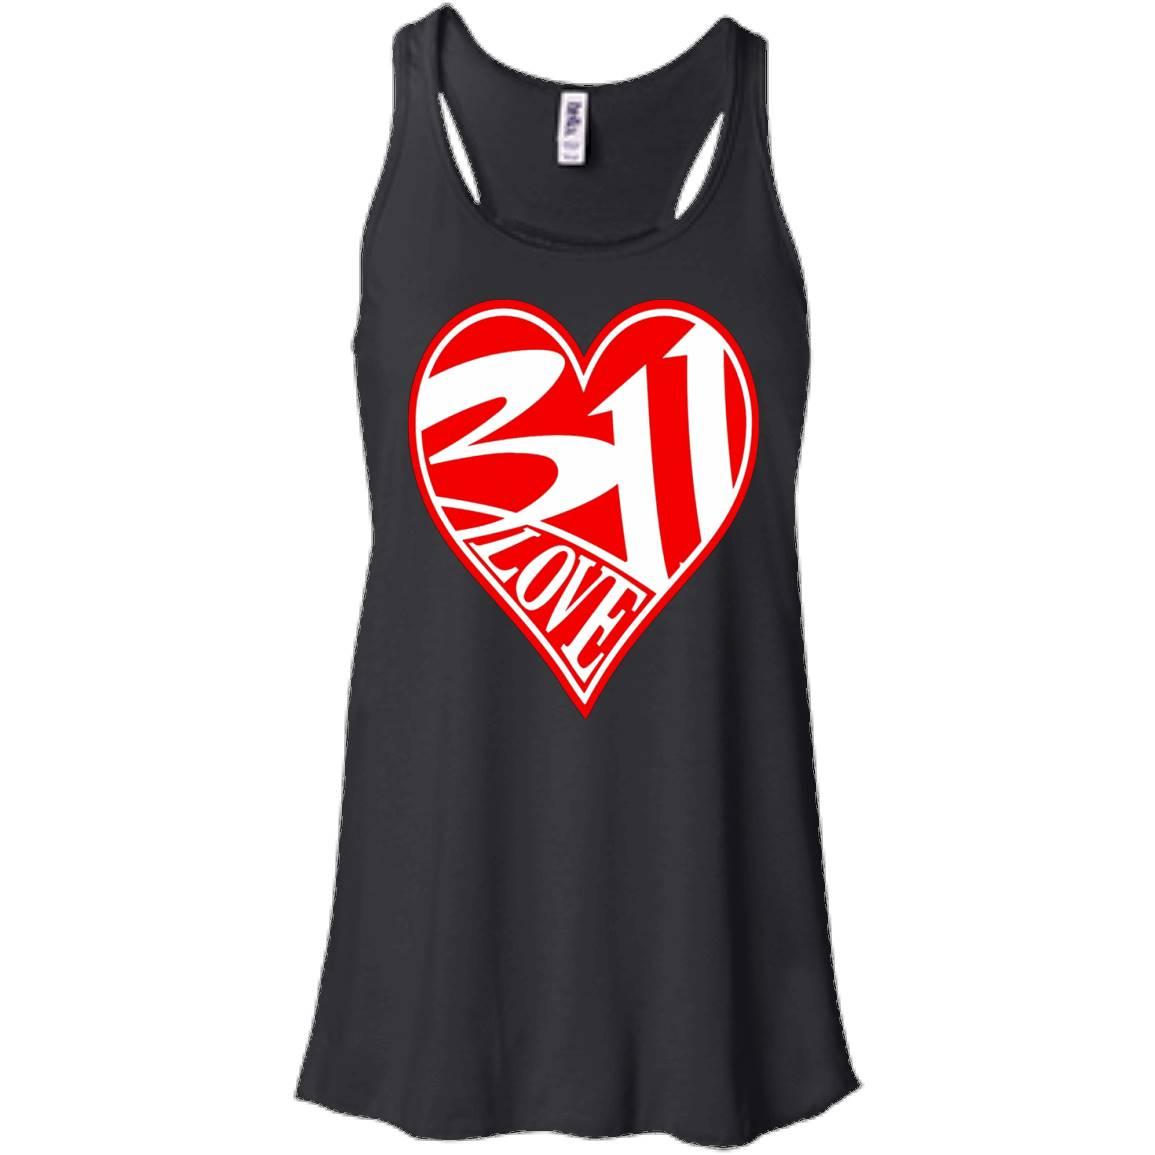 311 Love Tshirt – Women Tank